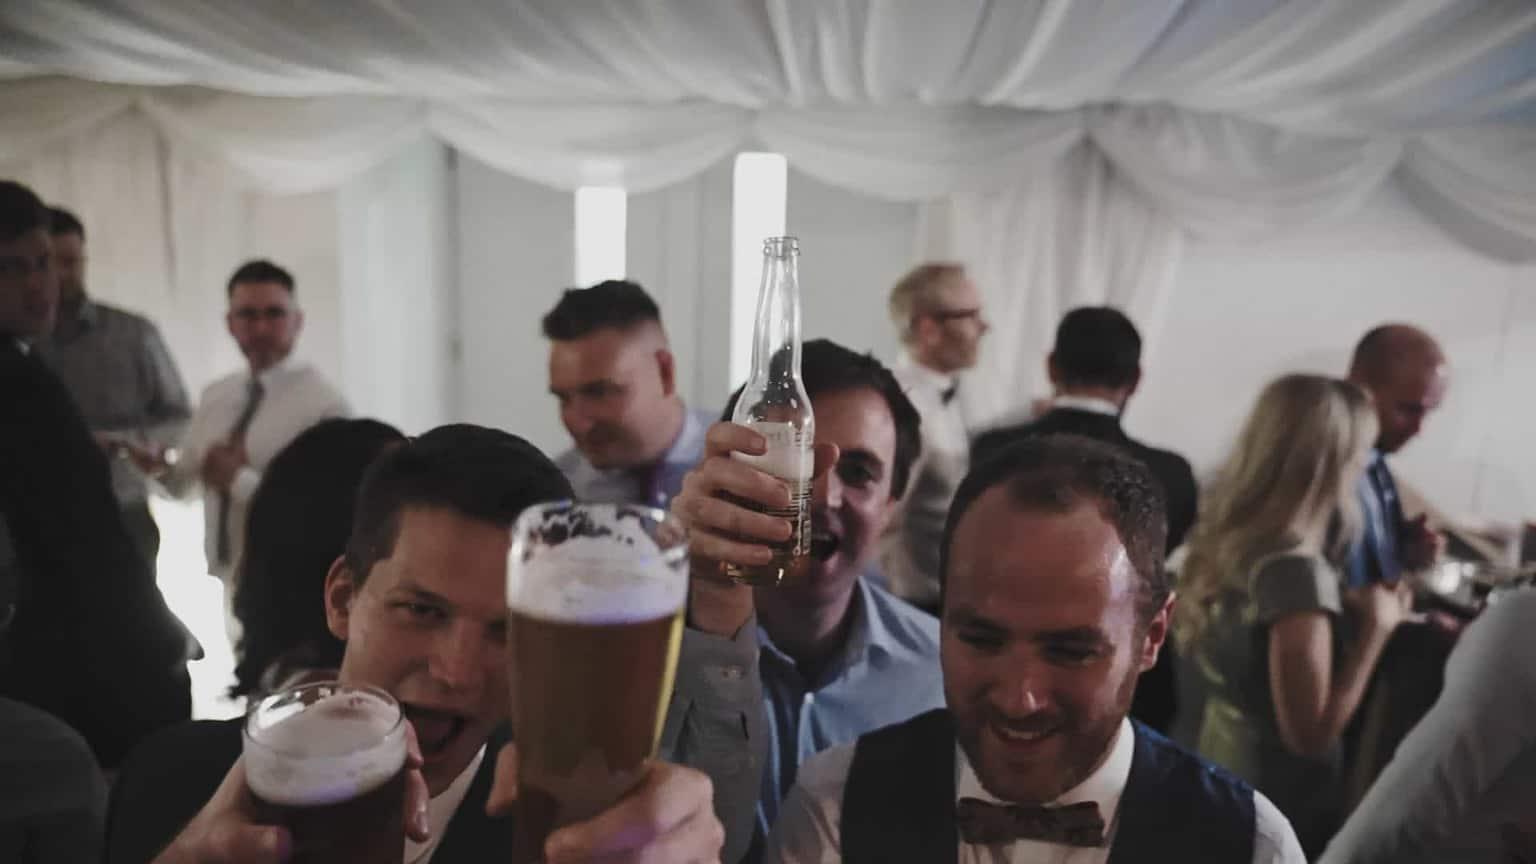 laughing people drinking beers